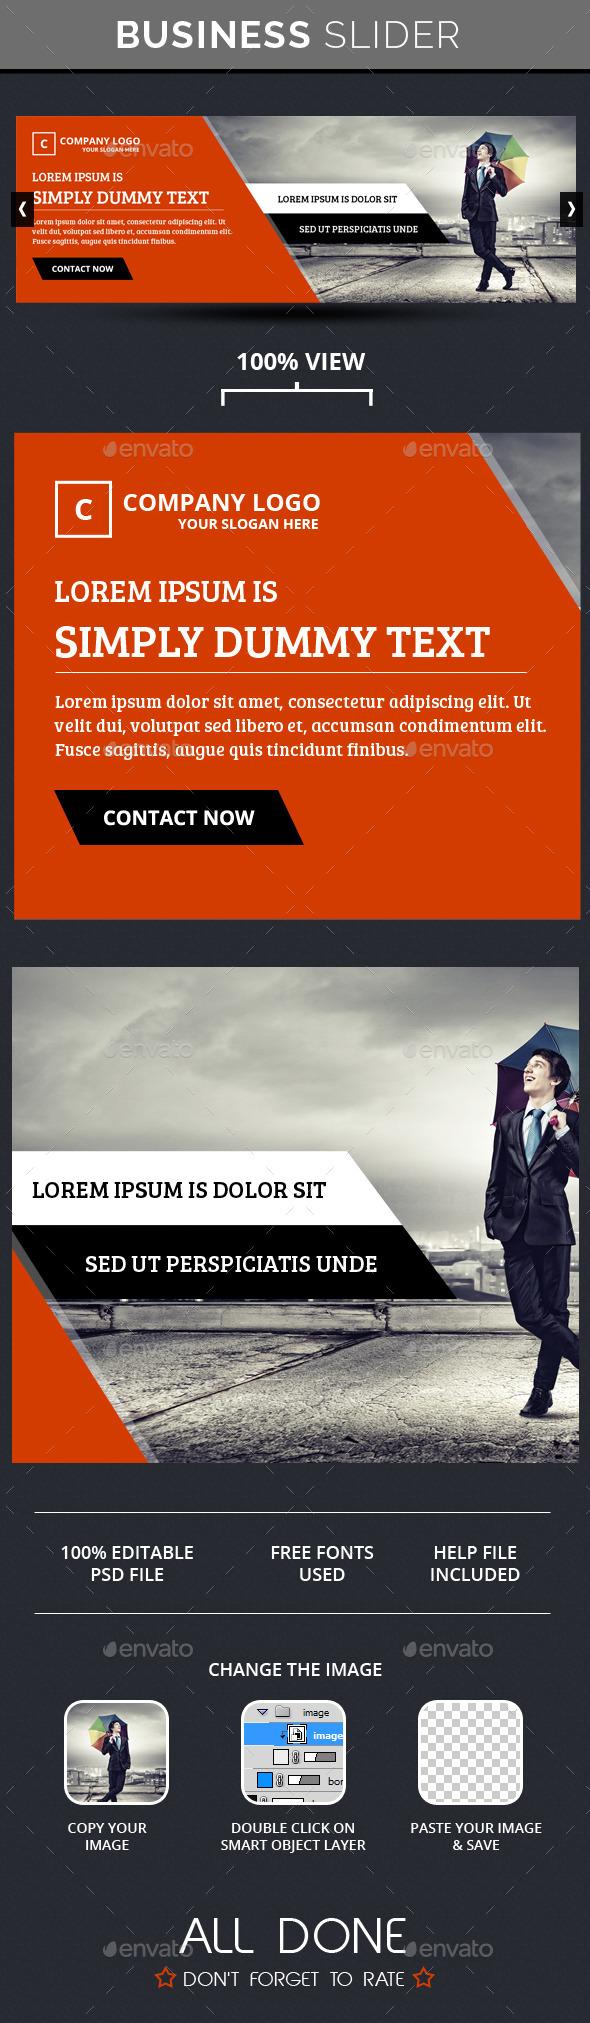 GraphicRiver Business Slide V6 10650144